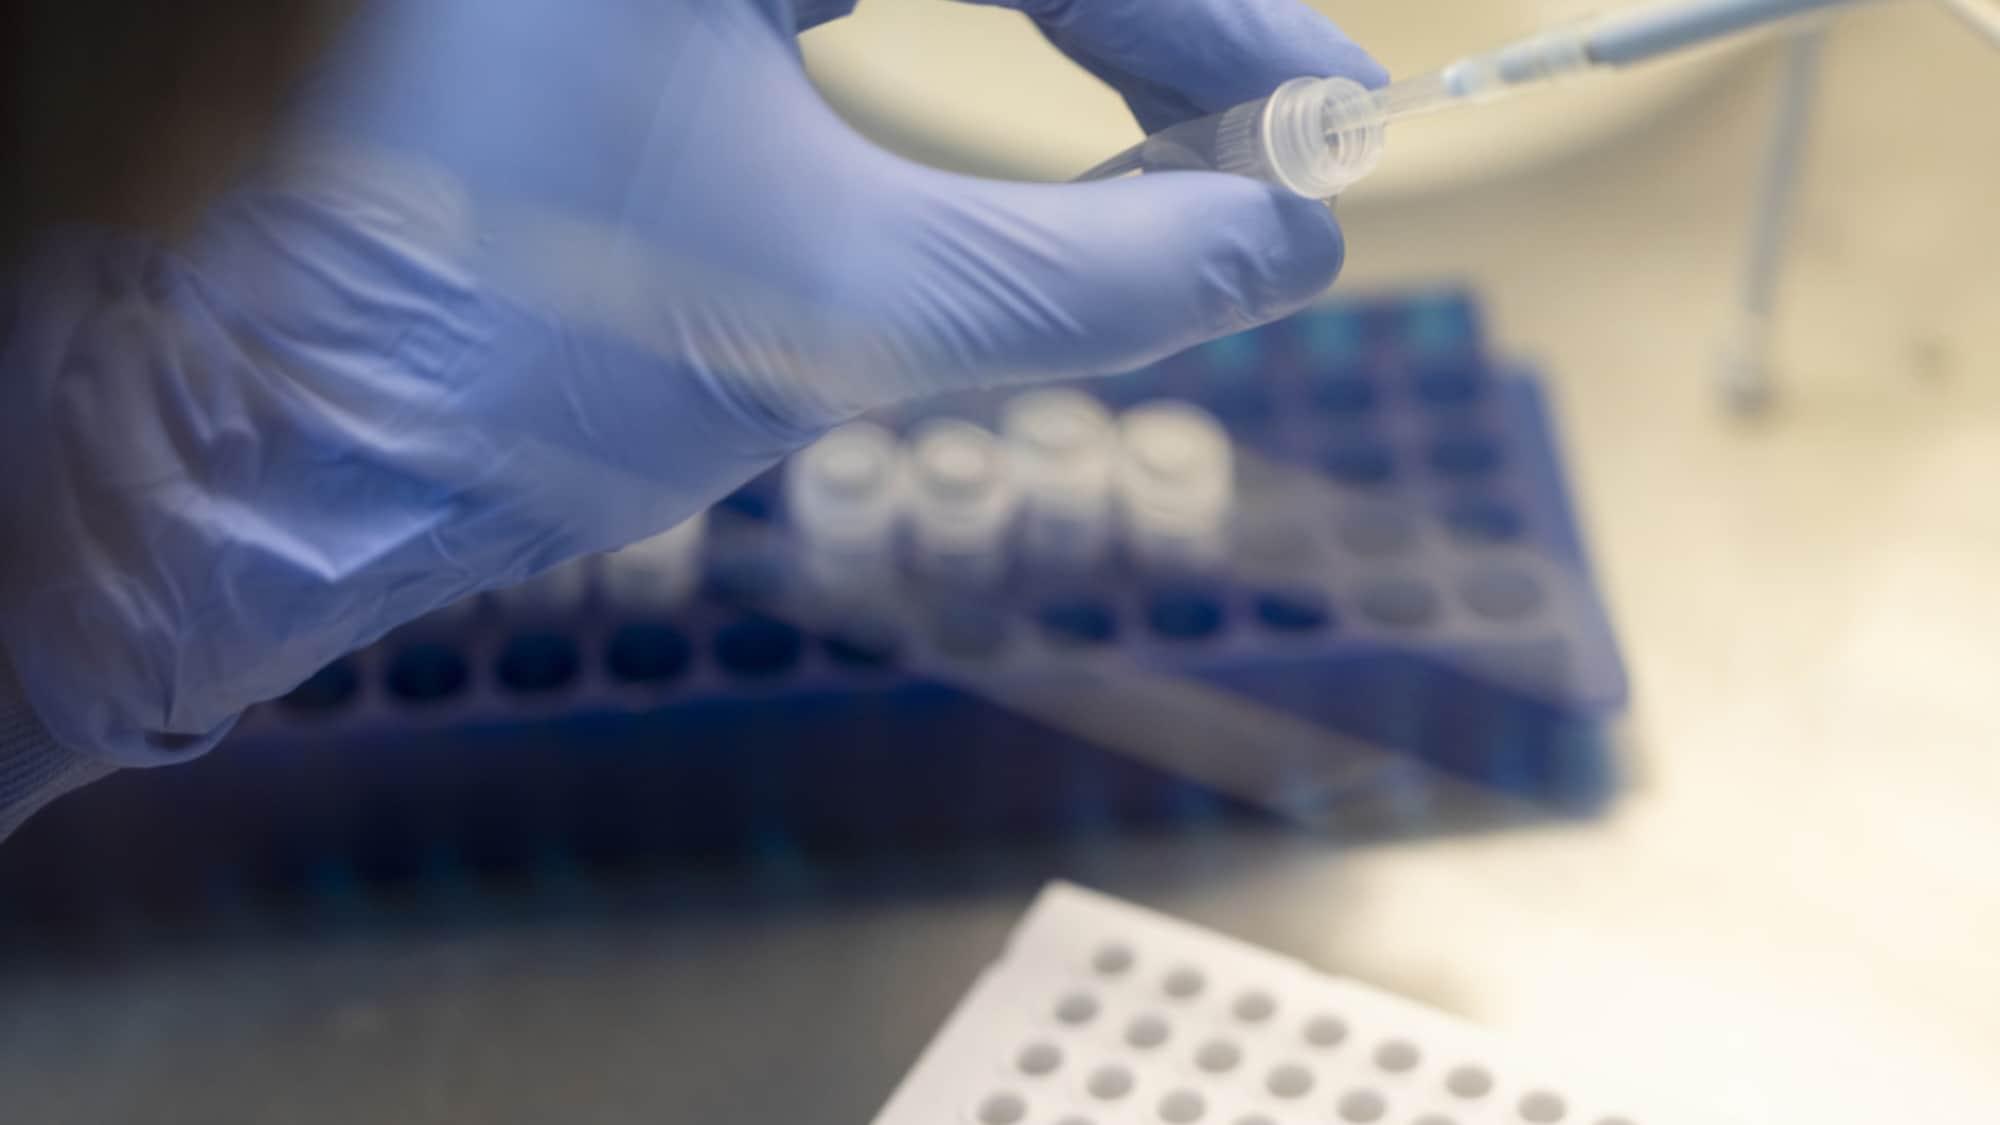 Coronavirus: Bund verschärft Meldepflicht wegen Coronavirus